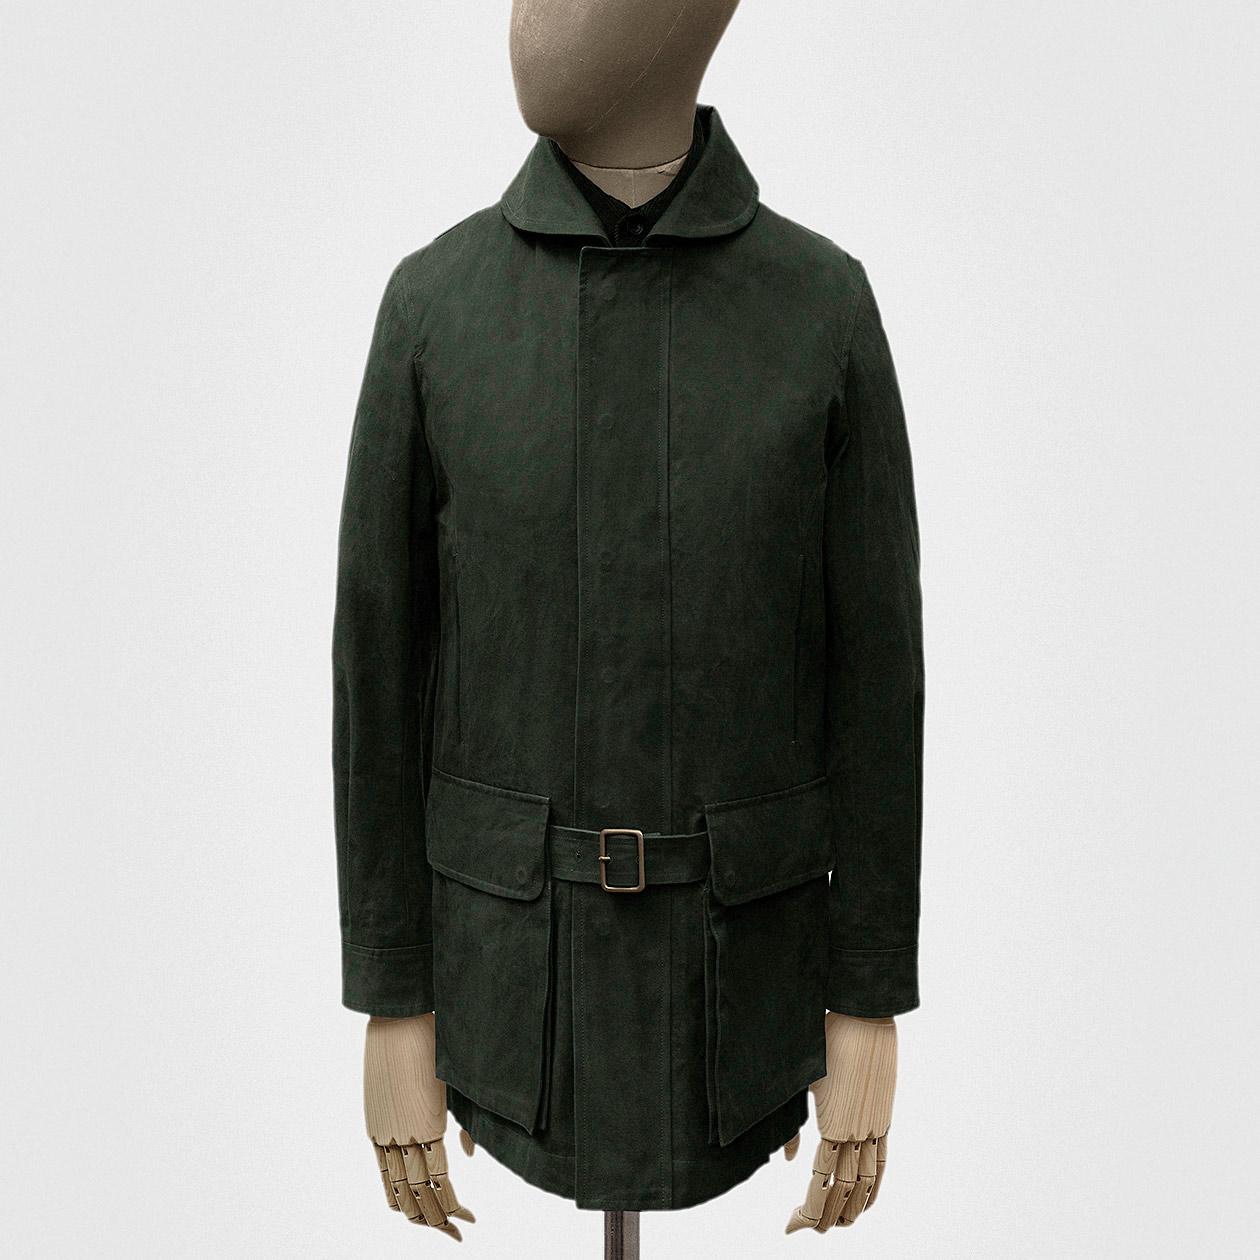 field-coat-canopy-cotton-dark-navy-1@2x-1.jpg